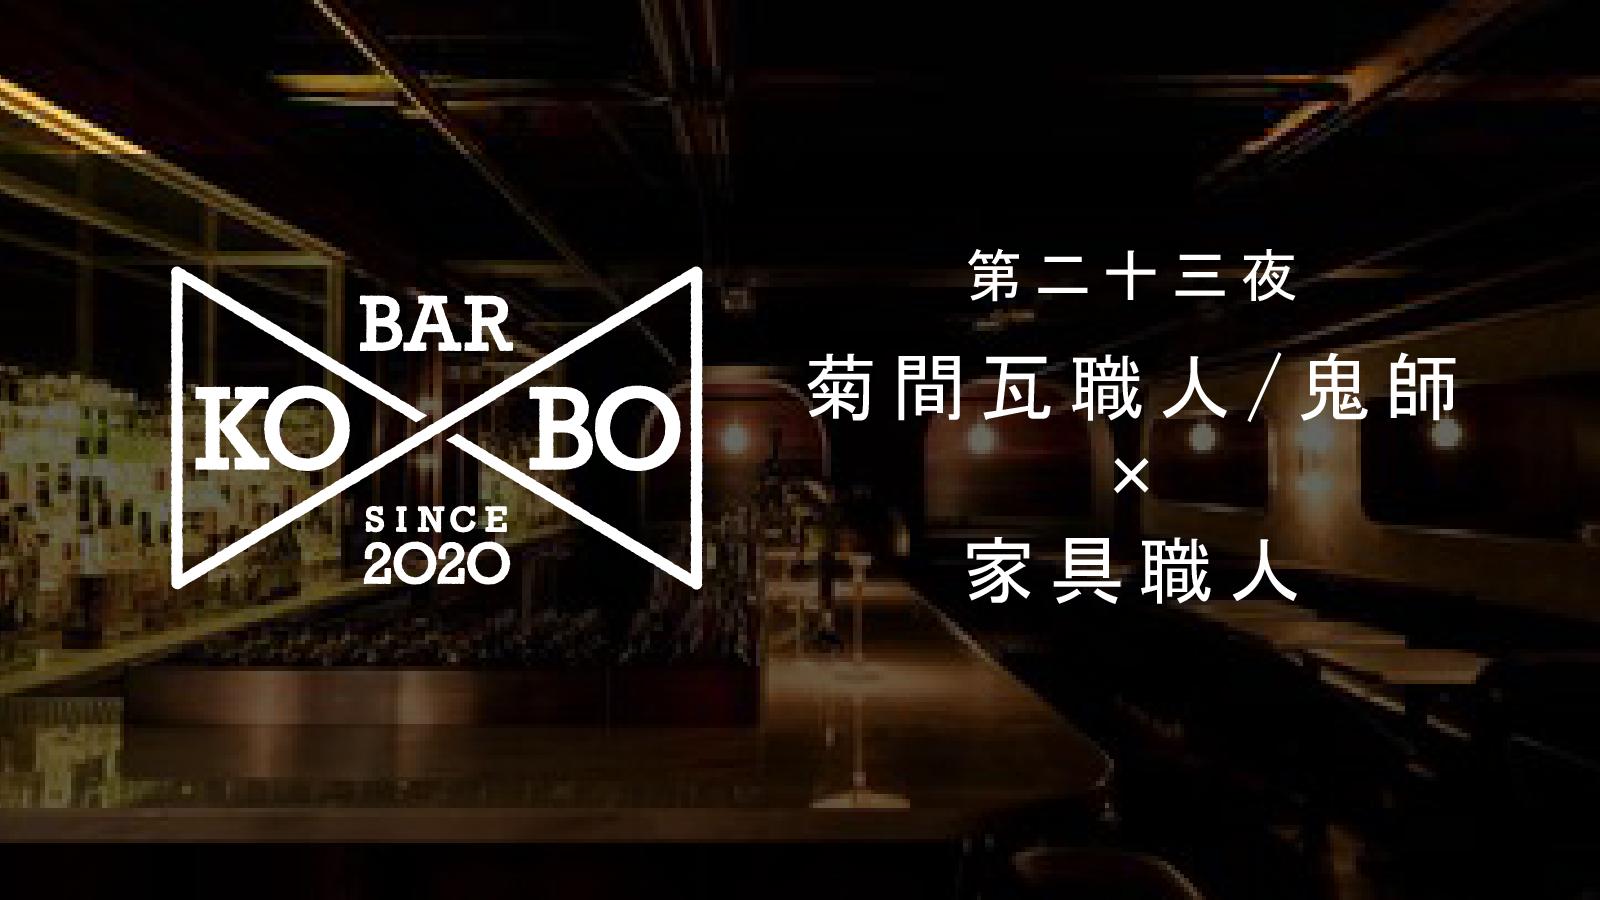 【Bar KO-BO 第二十三夜】菊間瓦職人/鬼師×家具職人